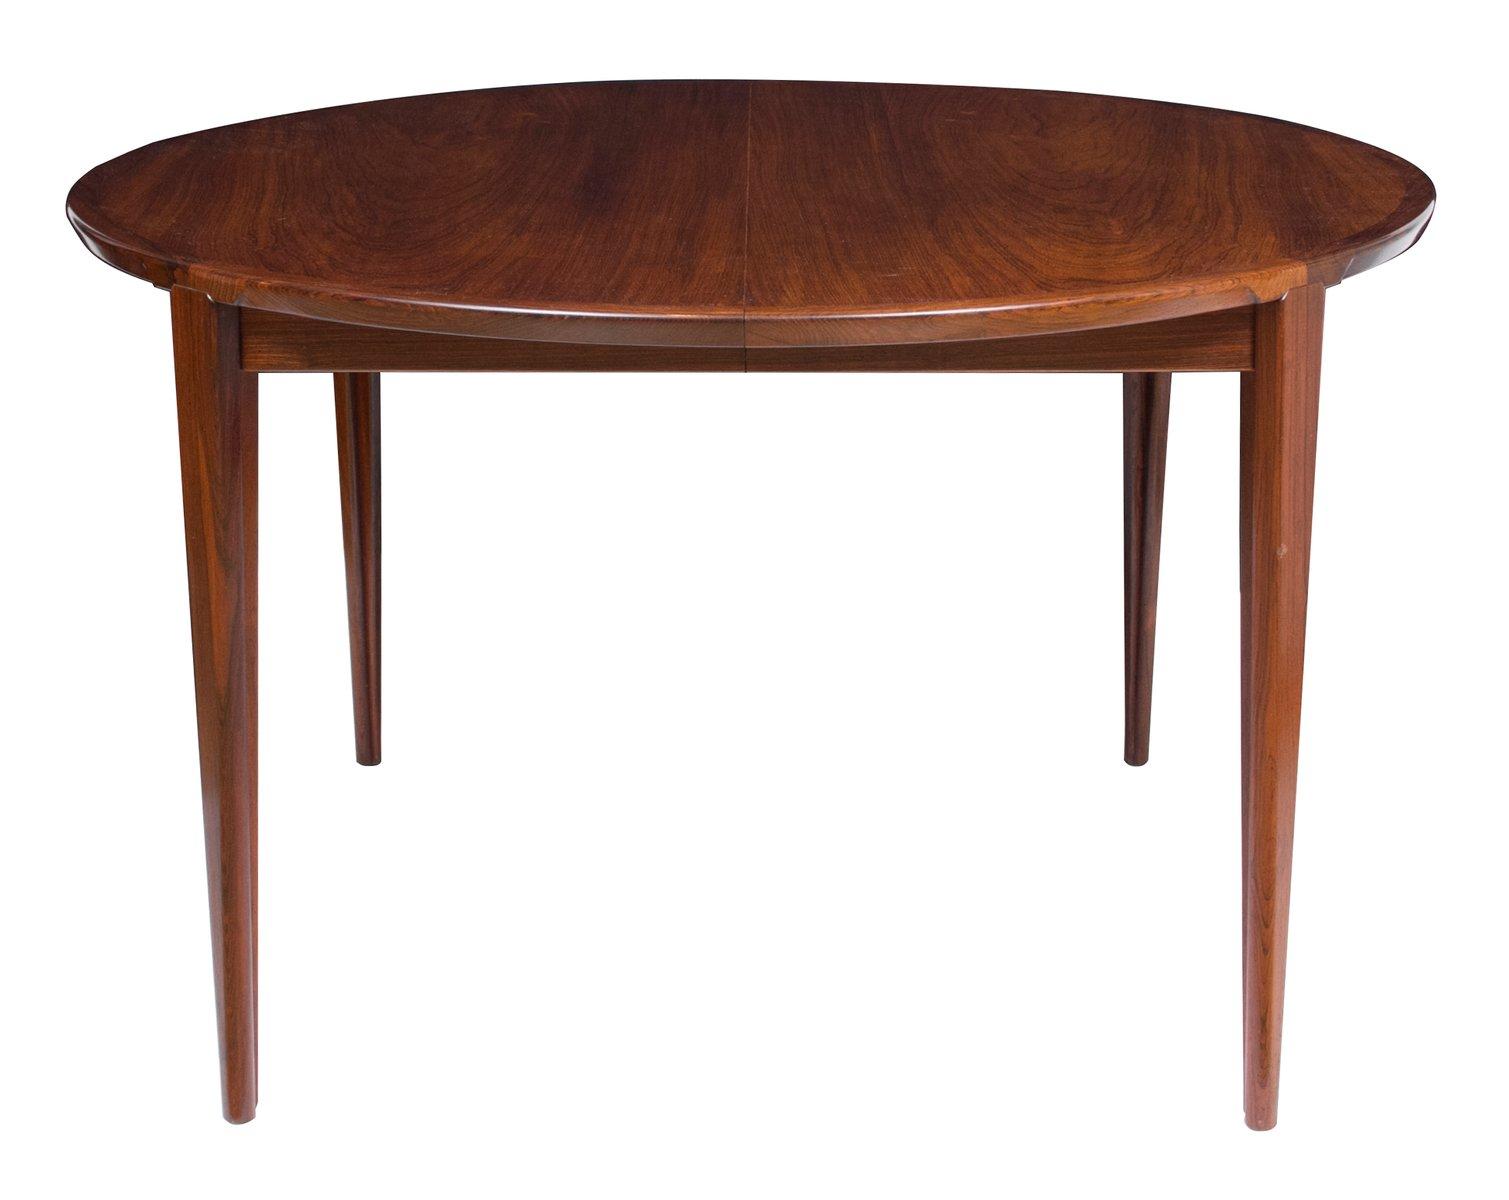 Table de salle manger en palissandre par henry rosengren for Table de salle a manger en solde